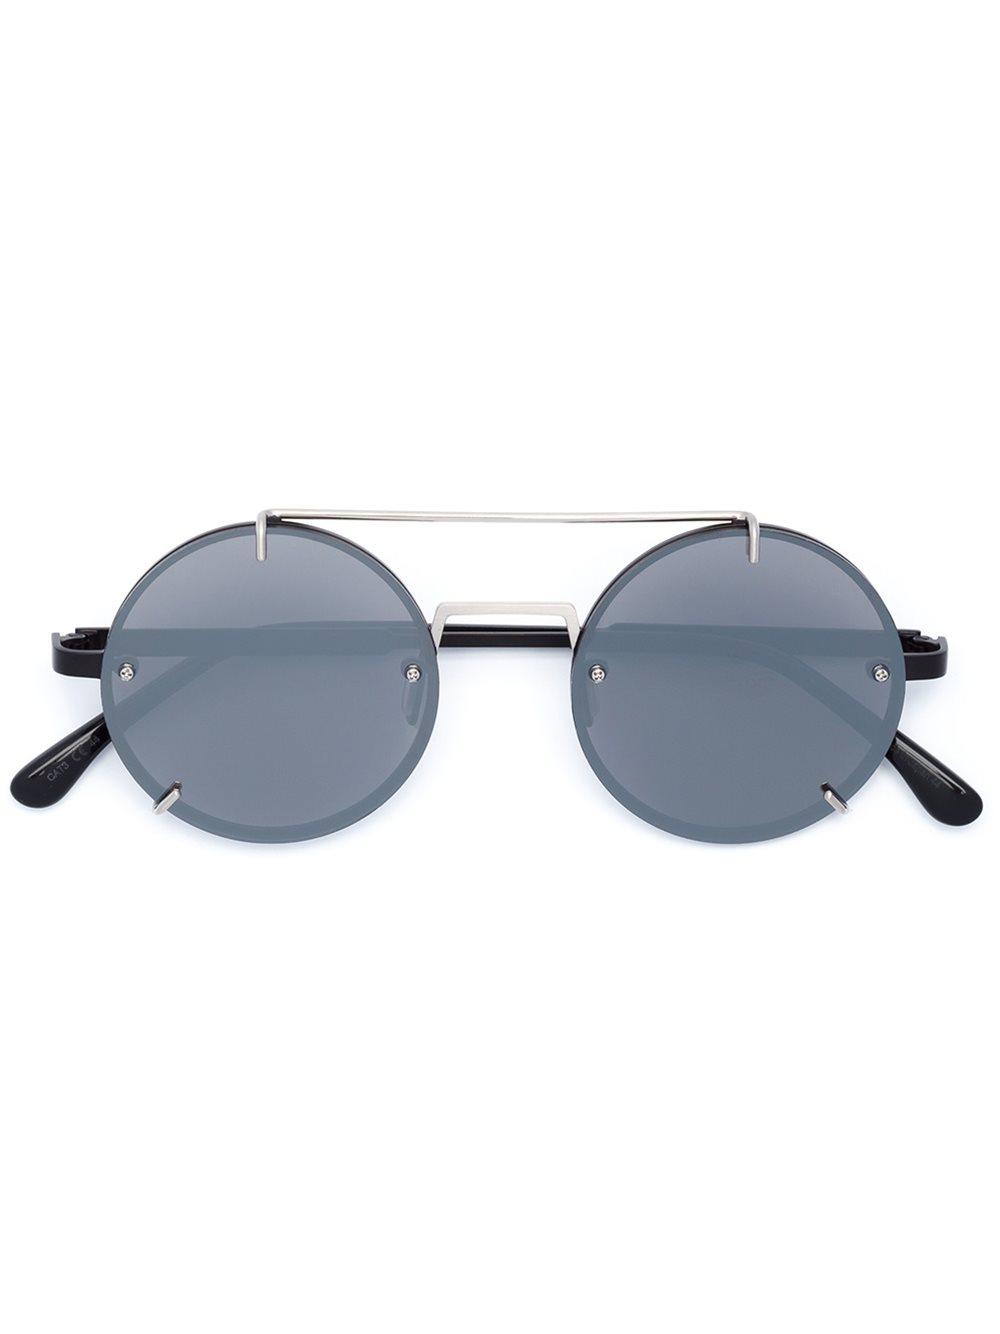 Слънчеви очила Vera Wang 713 лв.